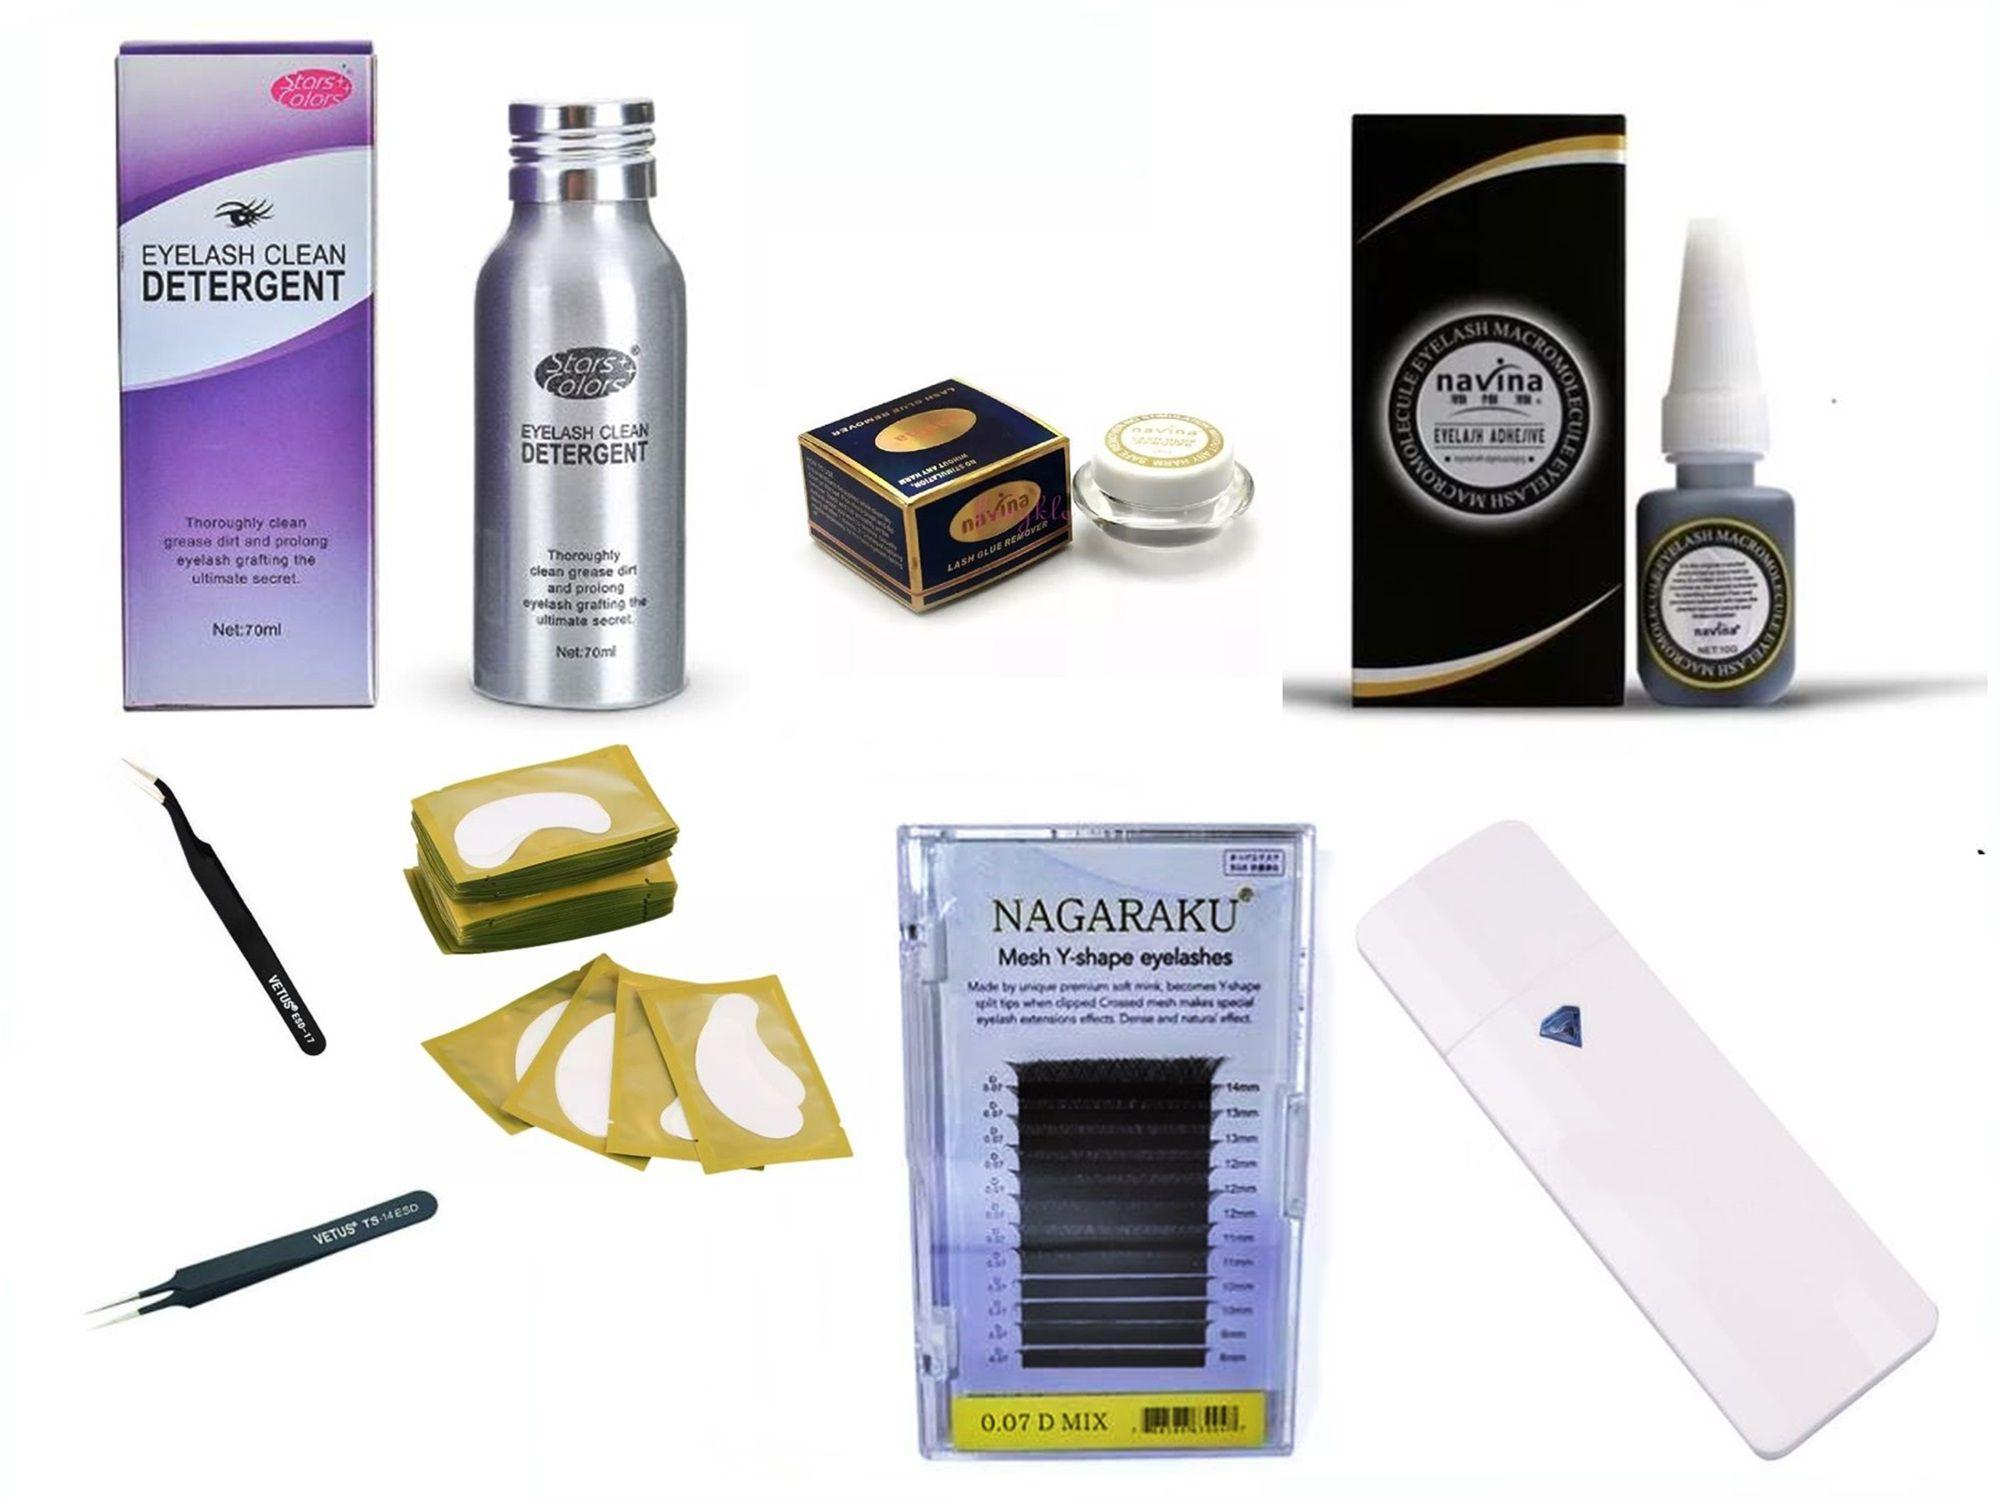 Kit Alongamento De Cílios Cola Cílios Nagaraku Removedor Limpador Nano Spray